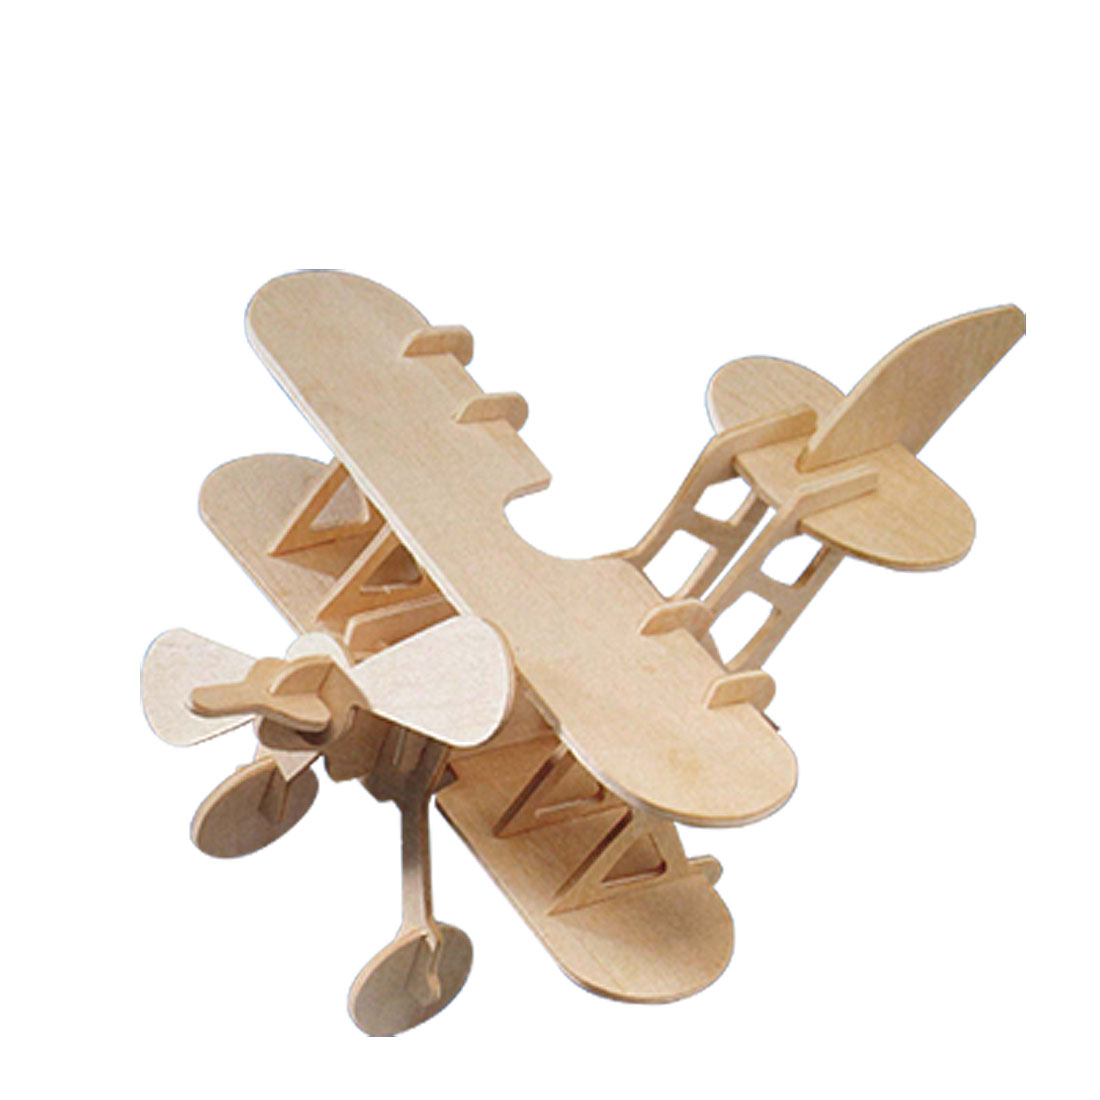 Toys - Wooden Puzzle Toy Models Bi-Plane